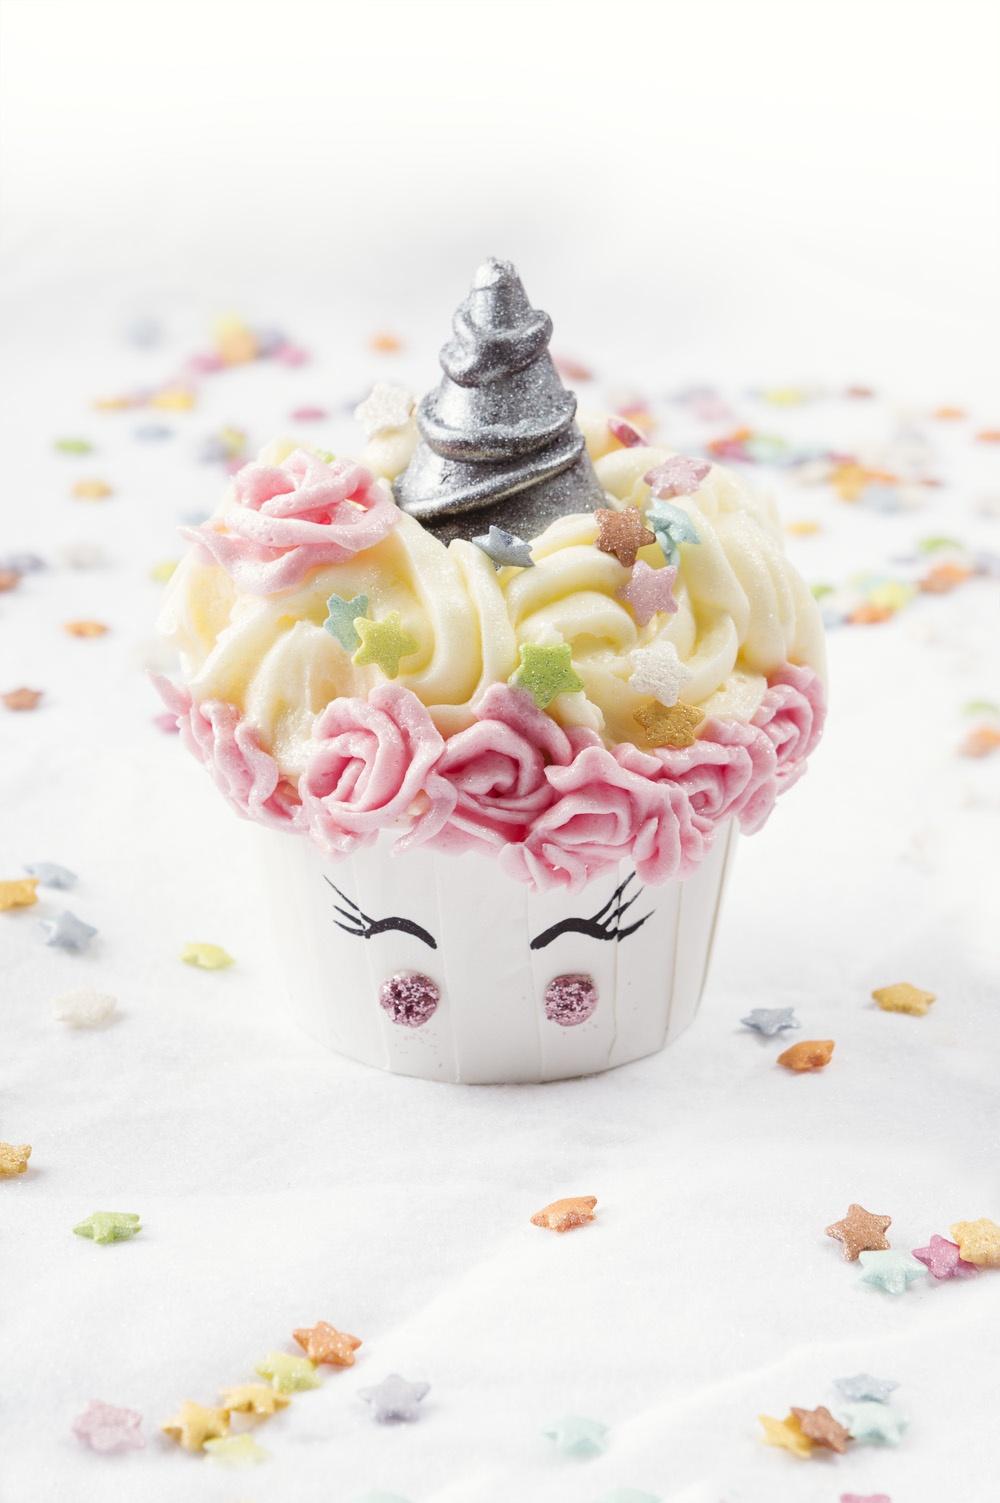 Champicorne cupcake - Studio de creation - Qui a vole les tartes